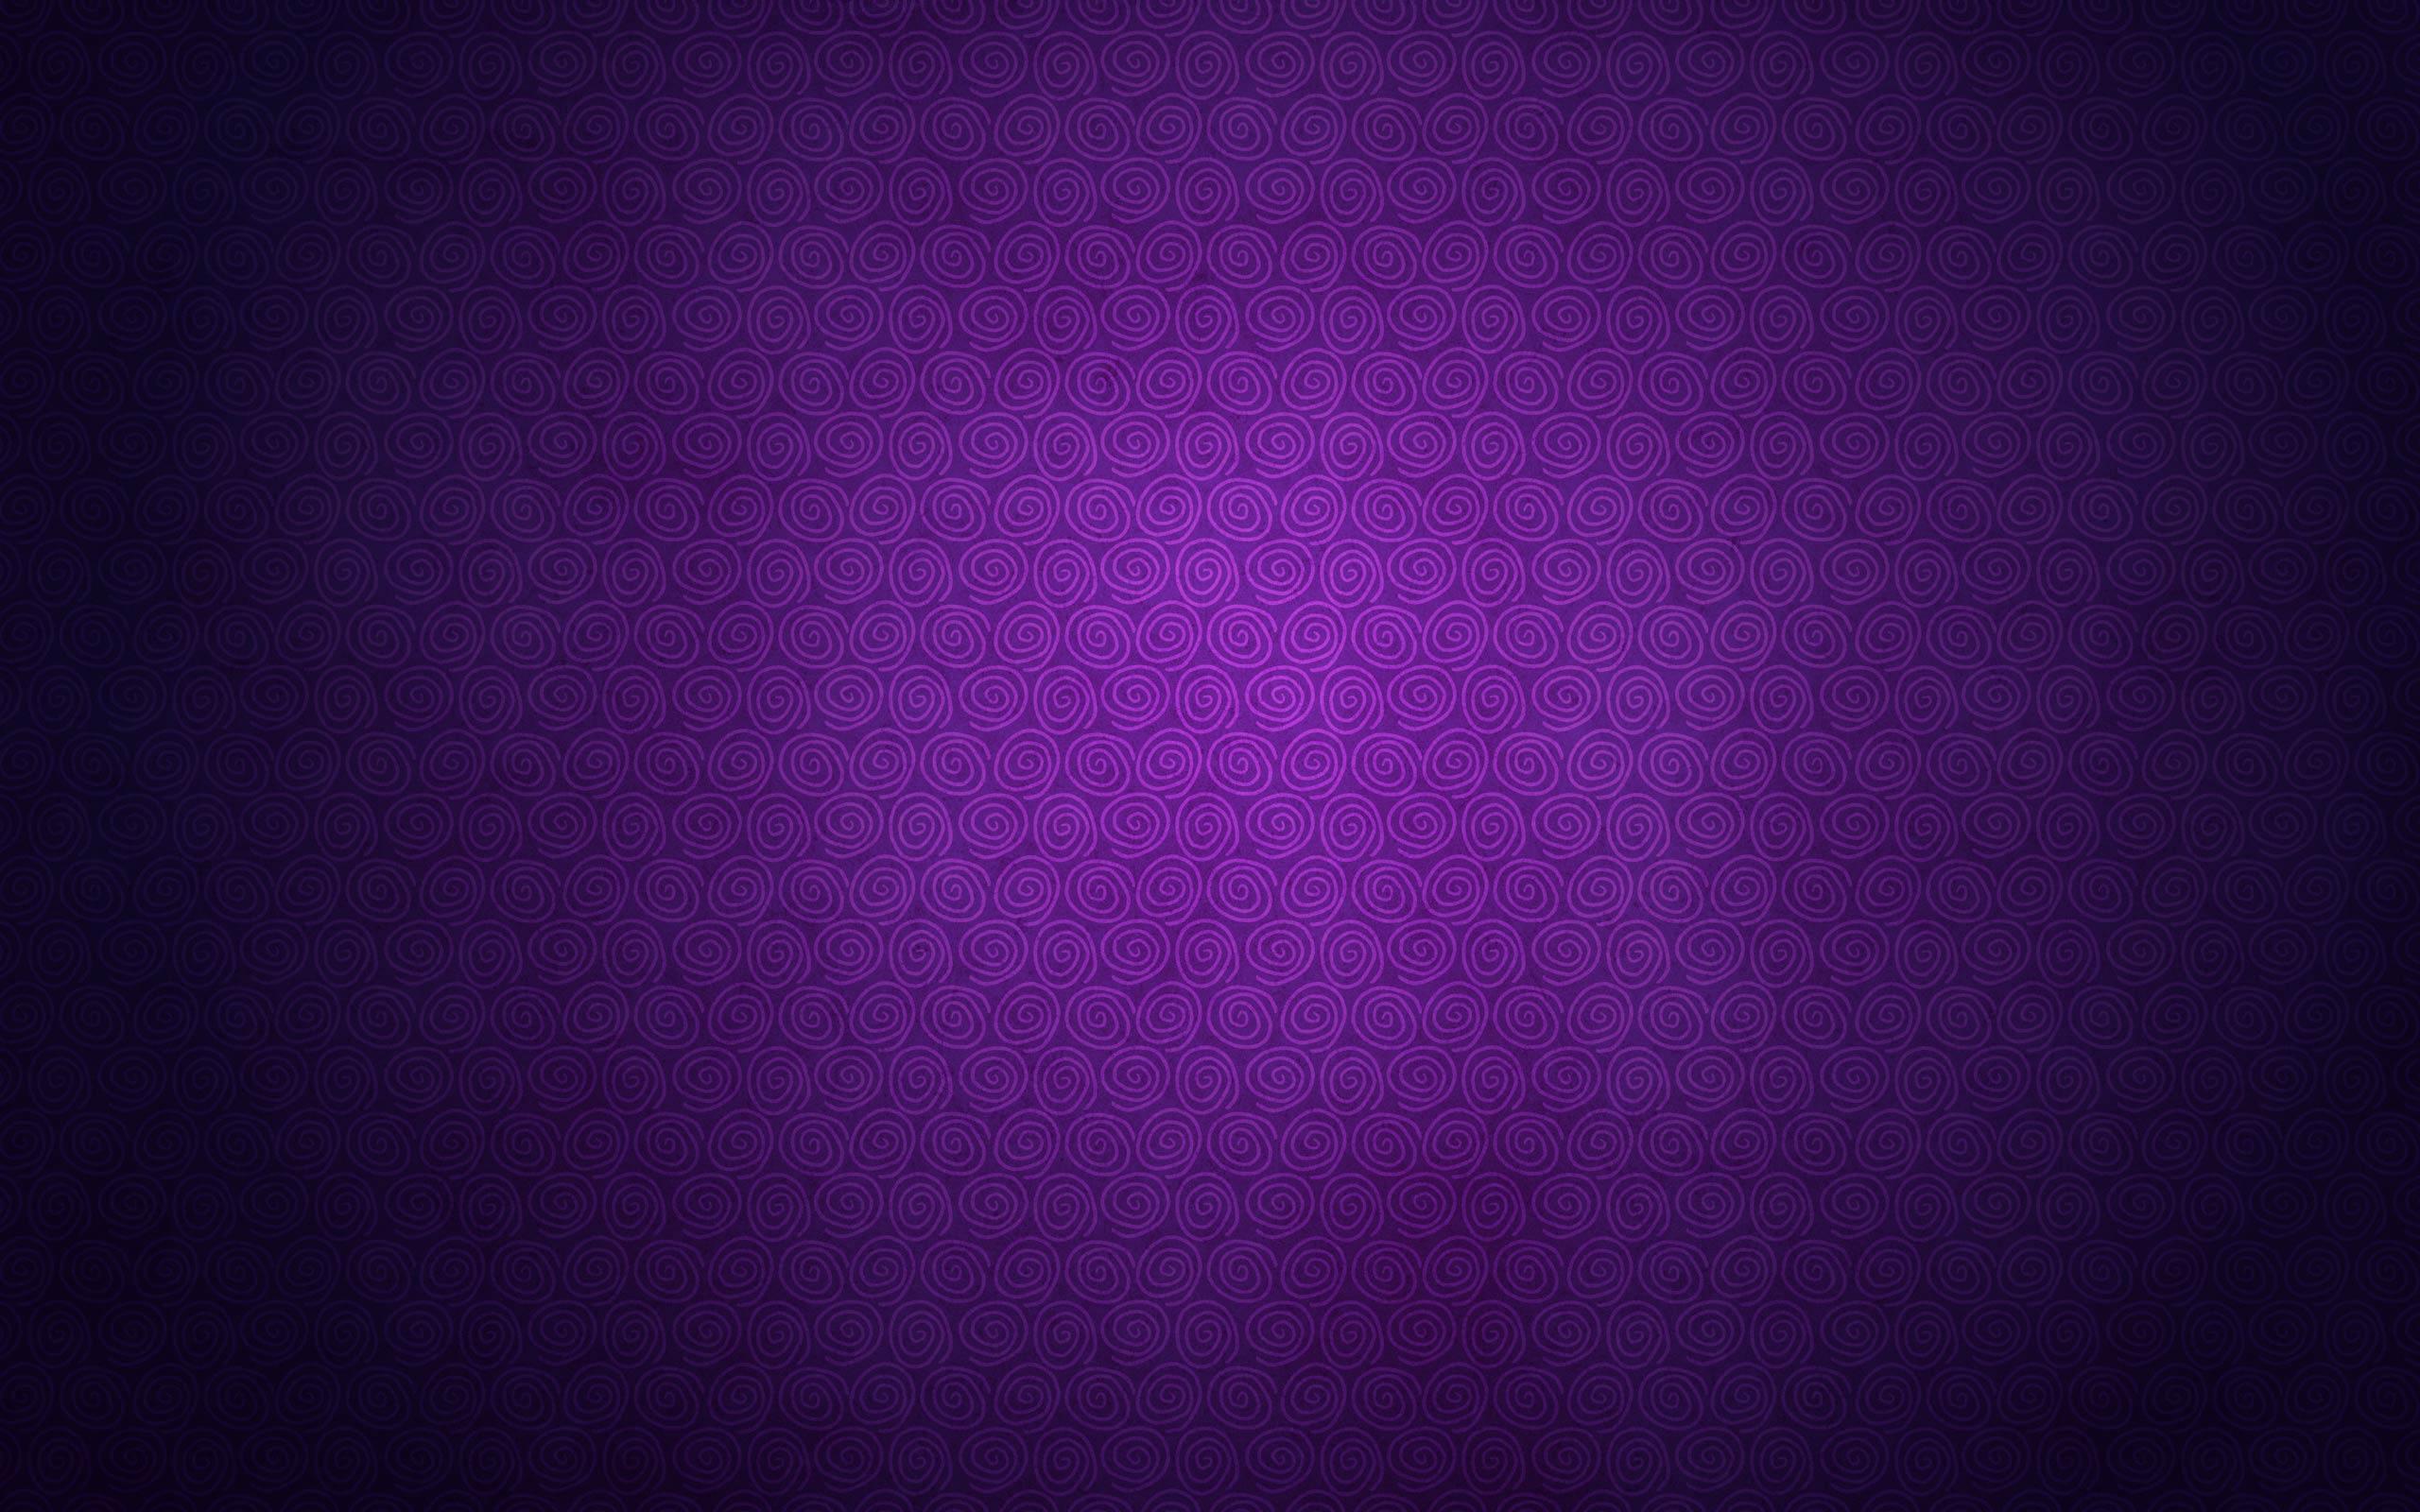 Purple Wallpaper Backgrounds 2560x1600